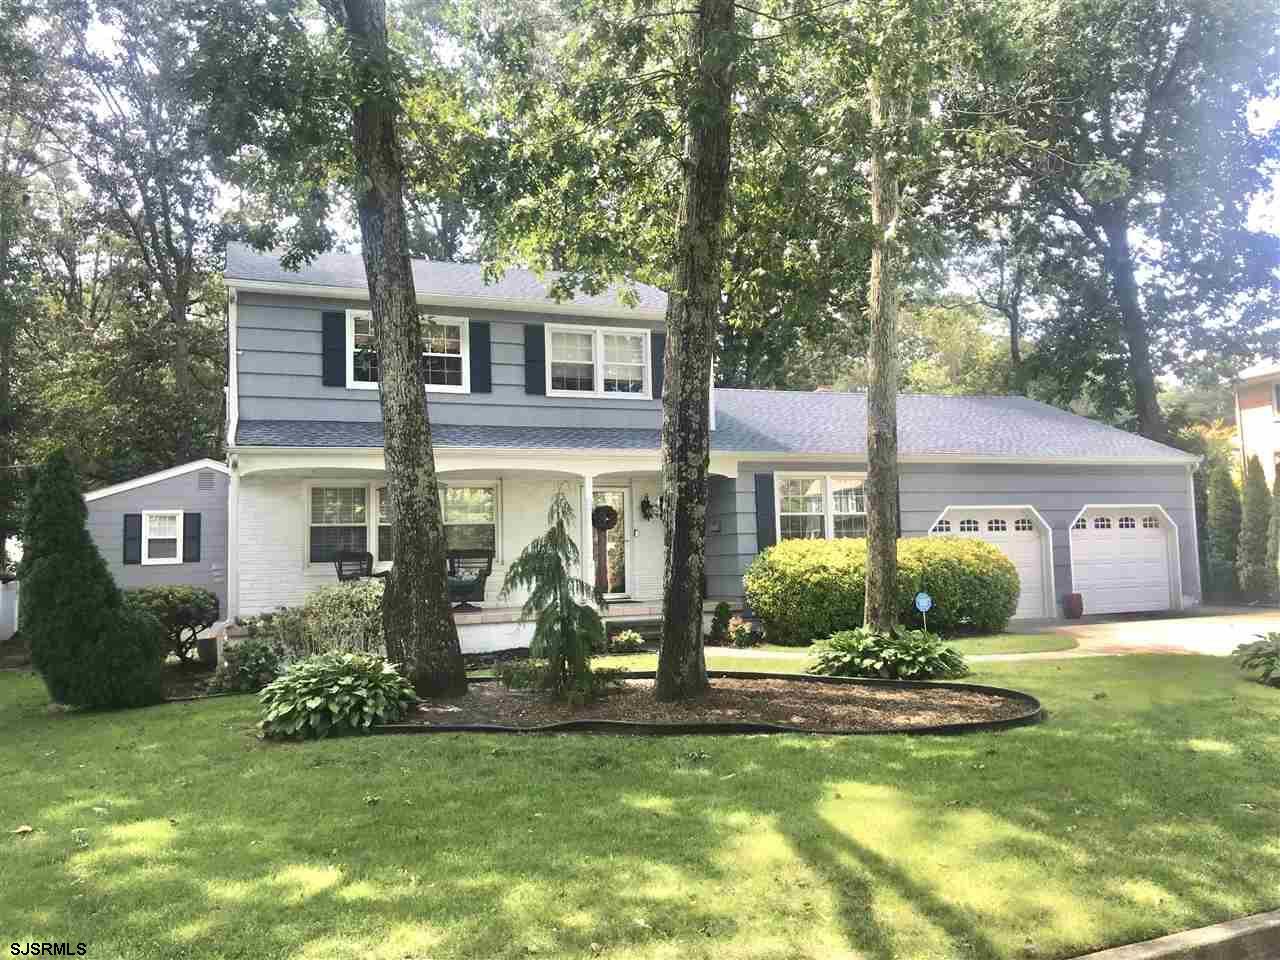 203 School House Dr, Linwood, NJ, 08221